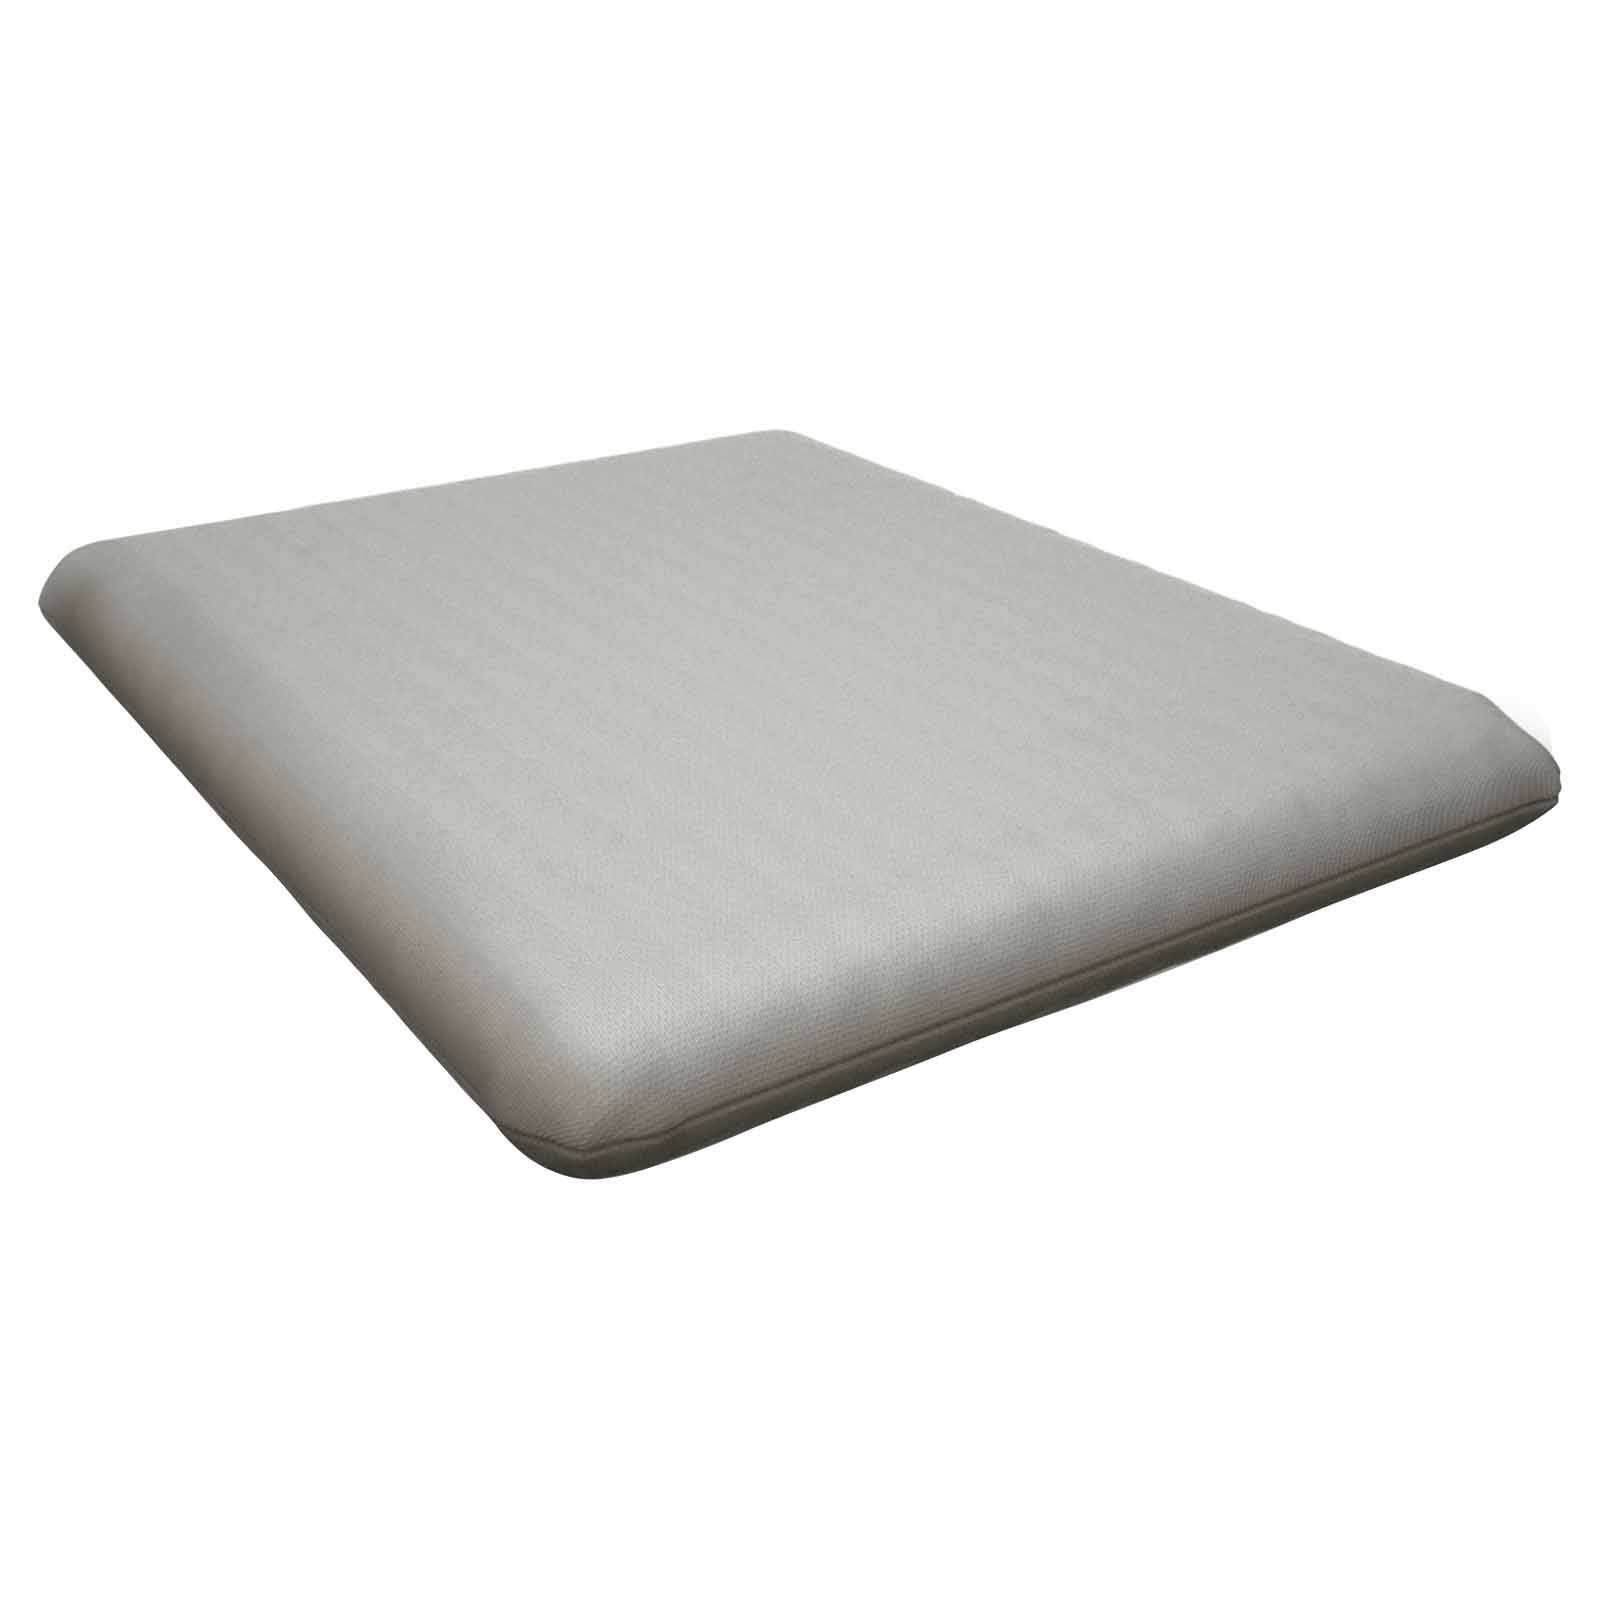 POLYWOOD® Sunbrella 17 x 20 in. Dining Chair Seat Cushion